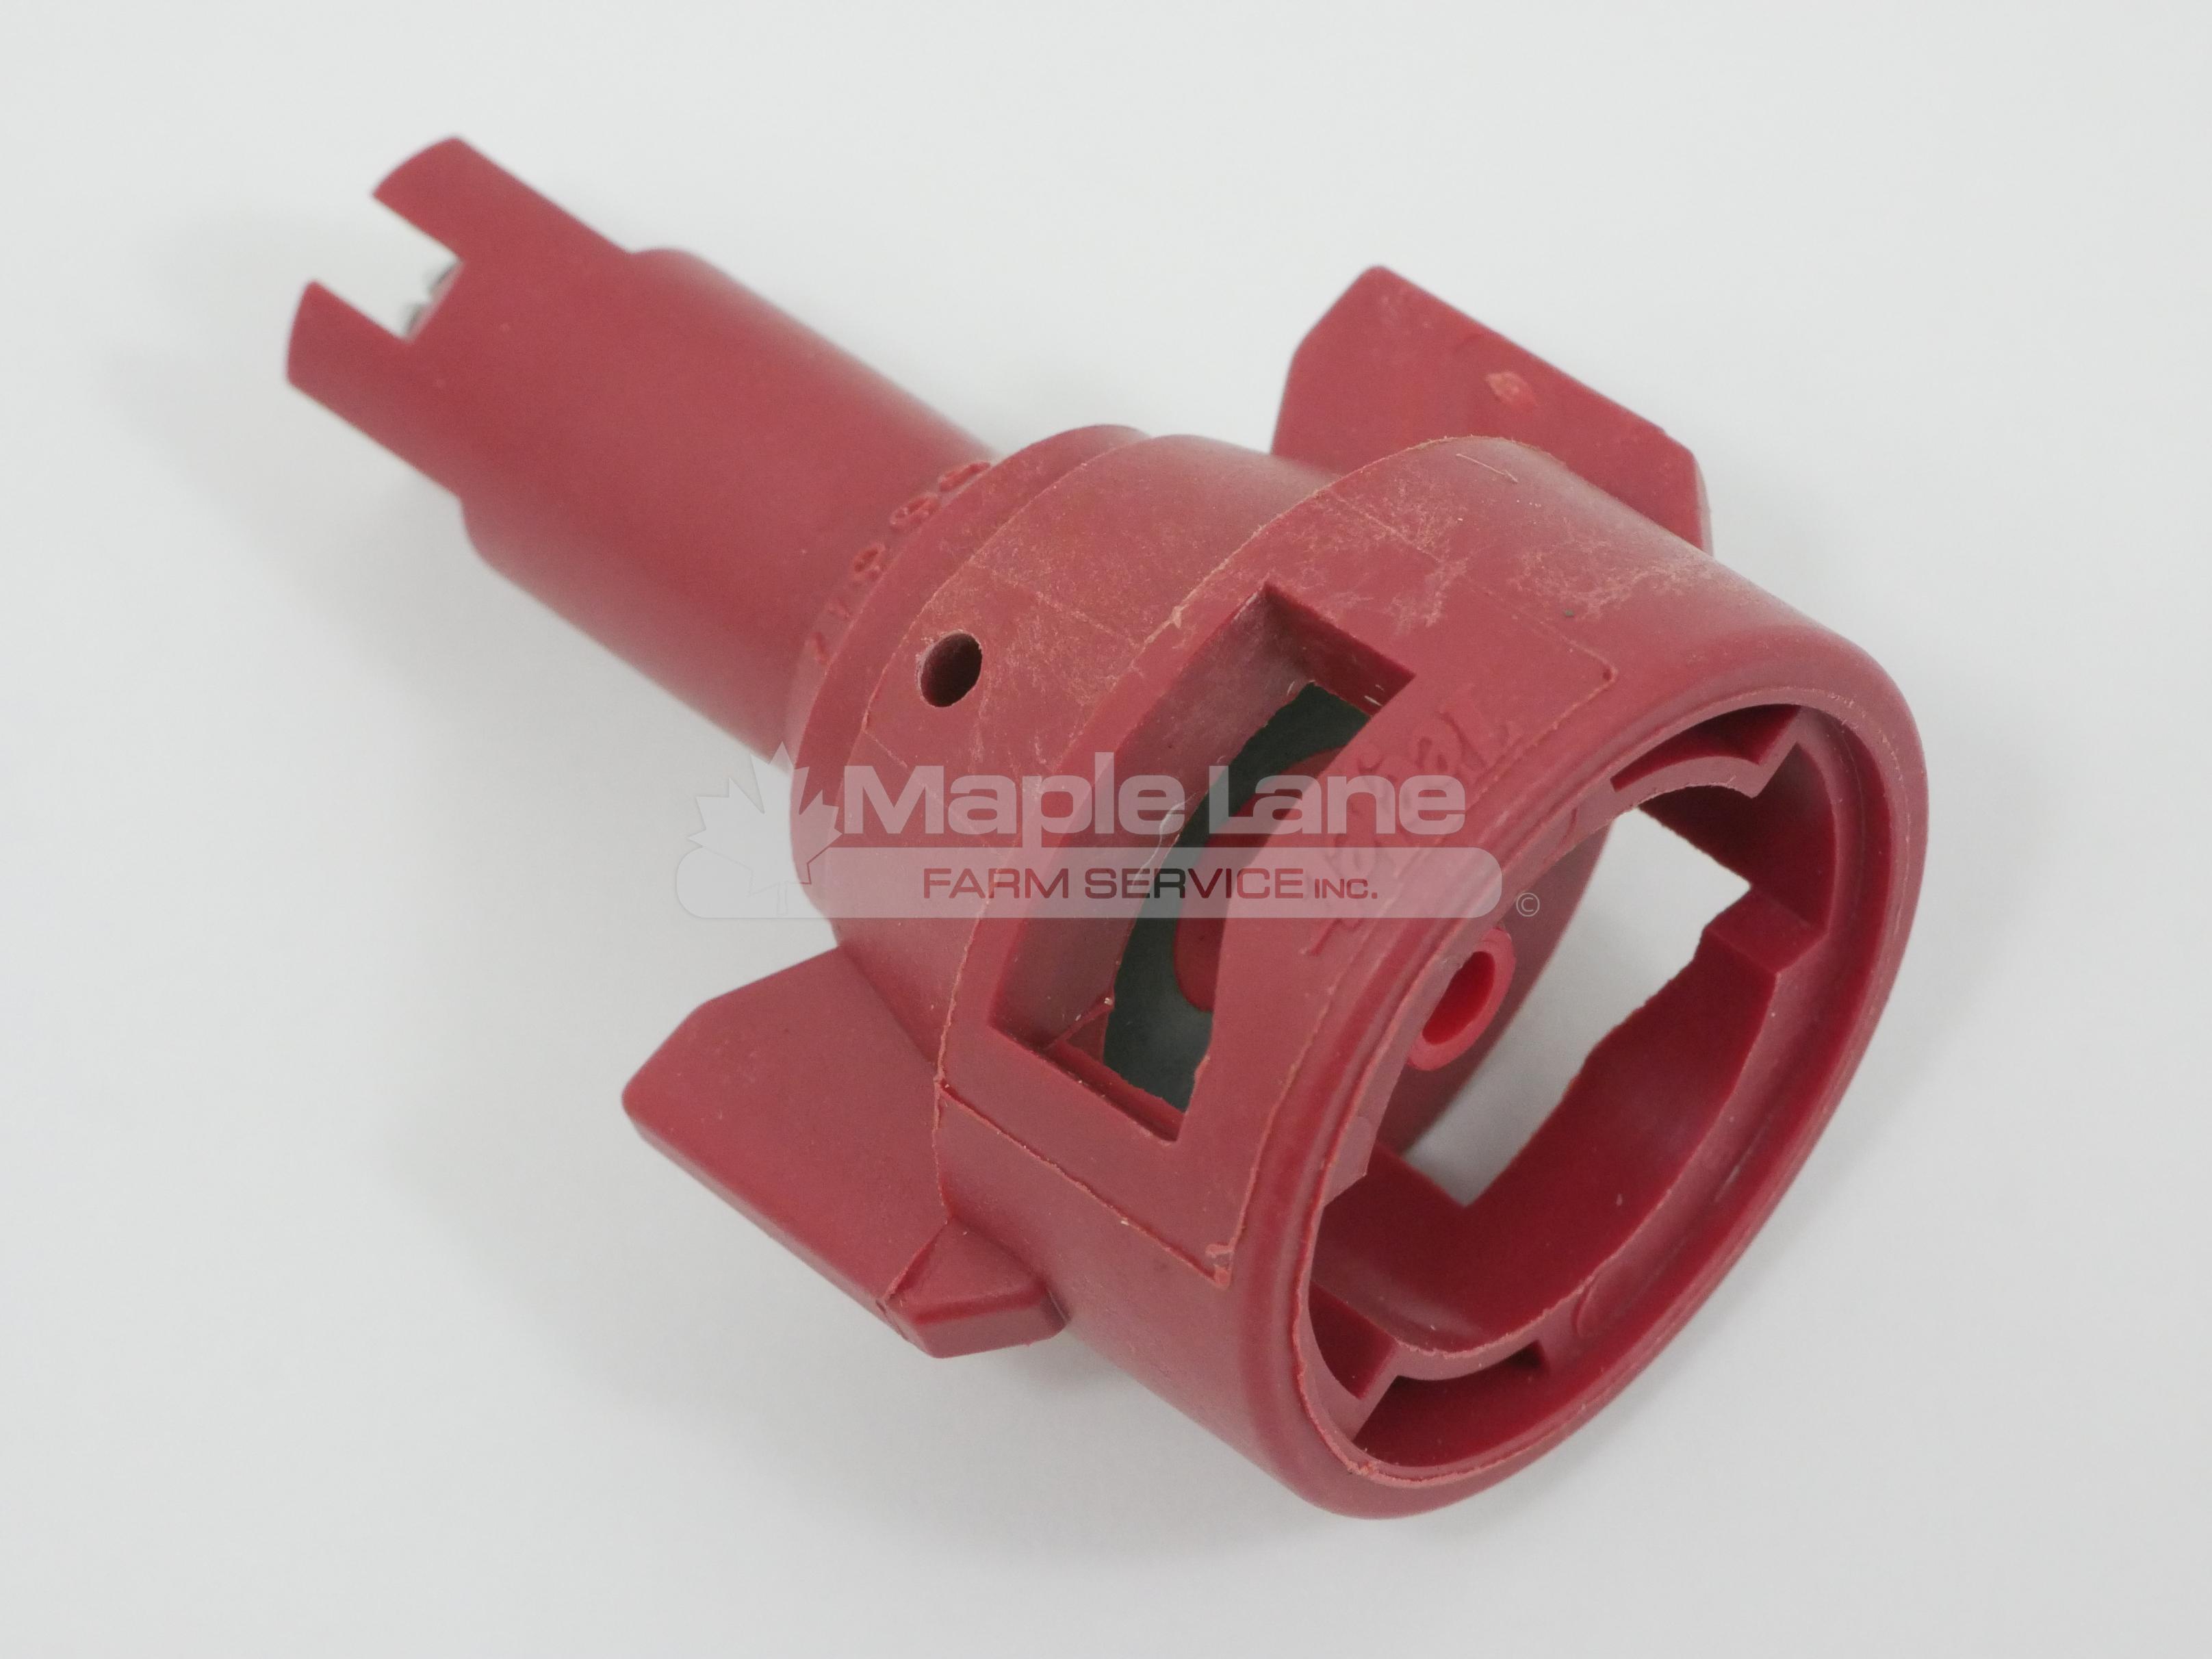 AG726270 Tip AIC11004-VS